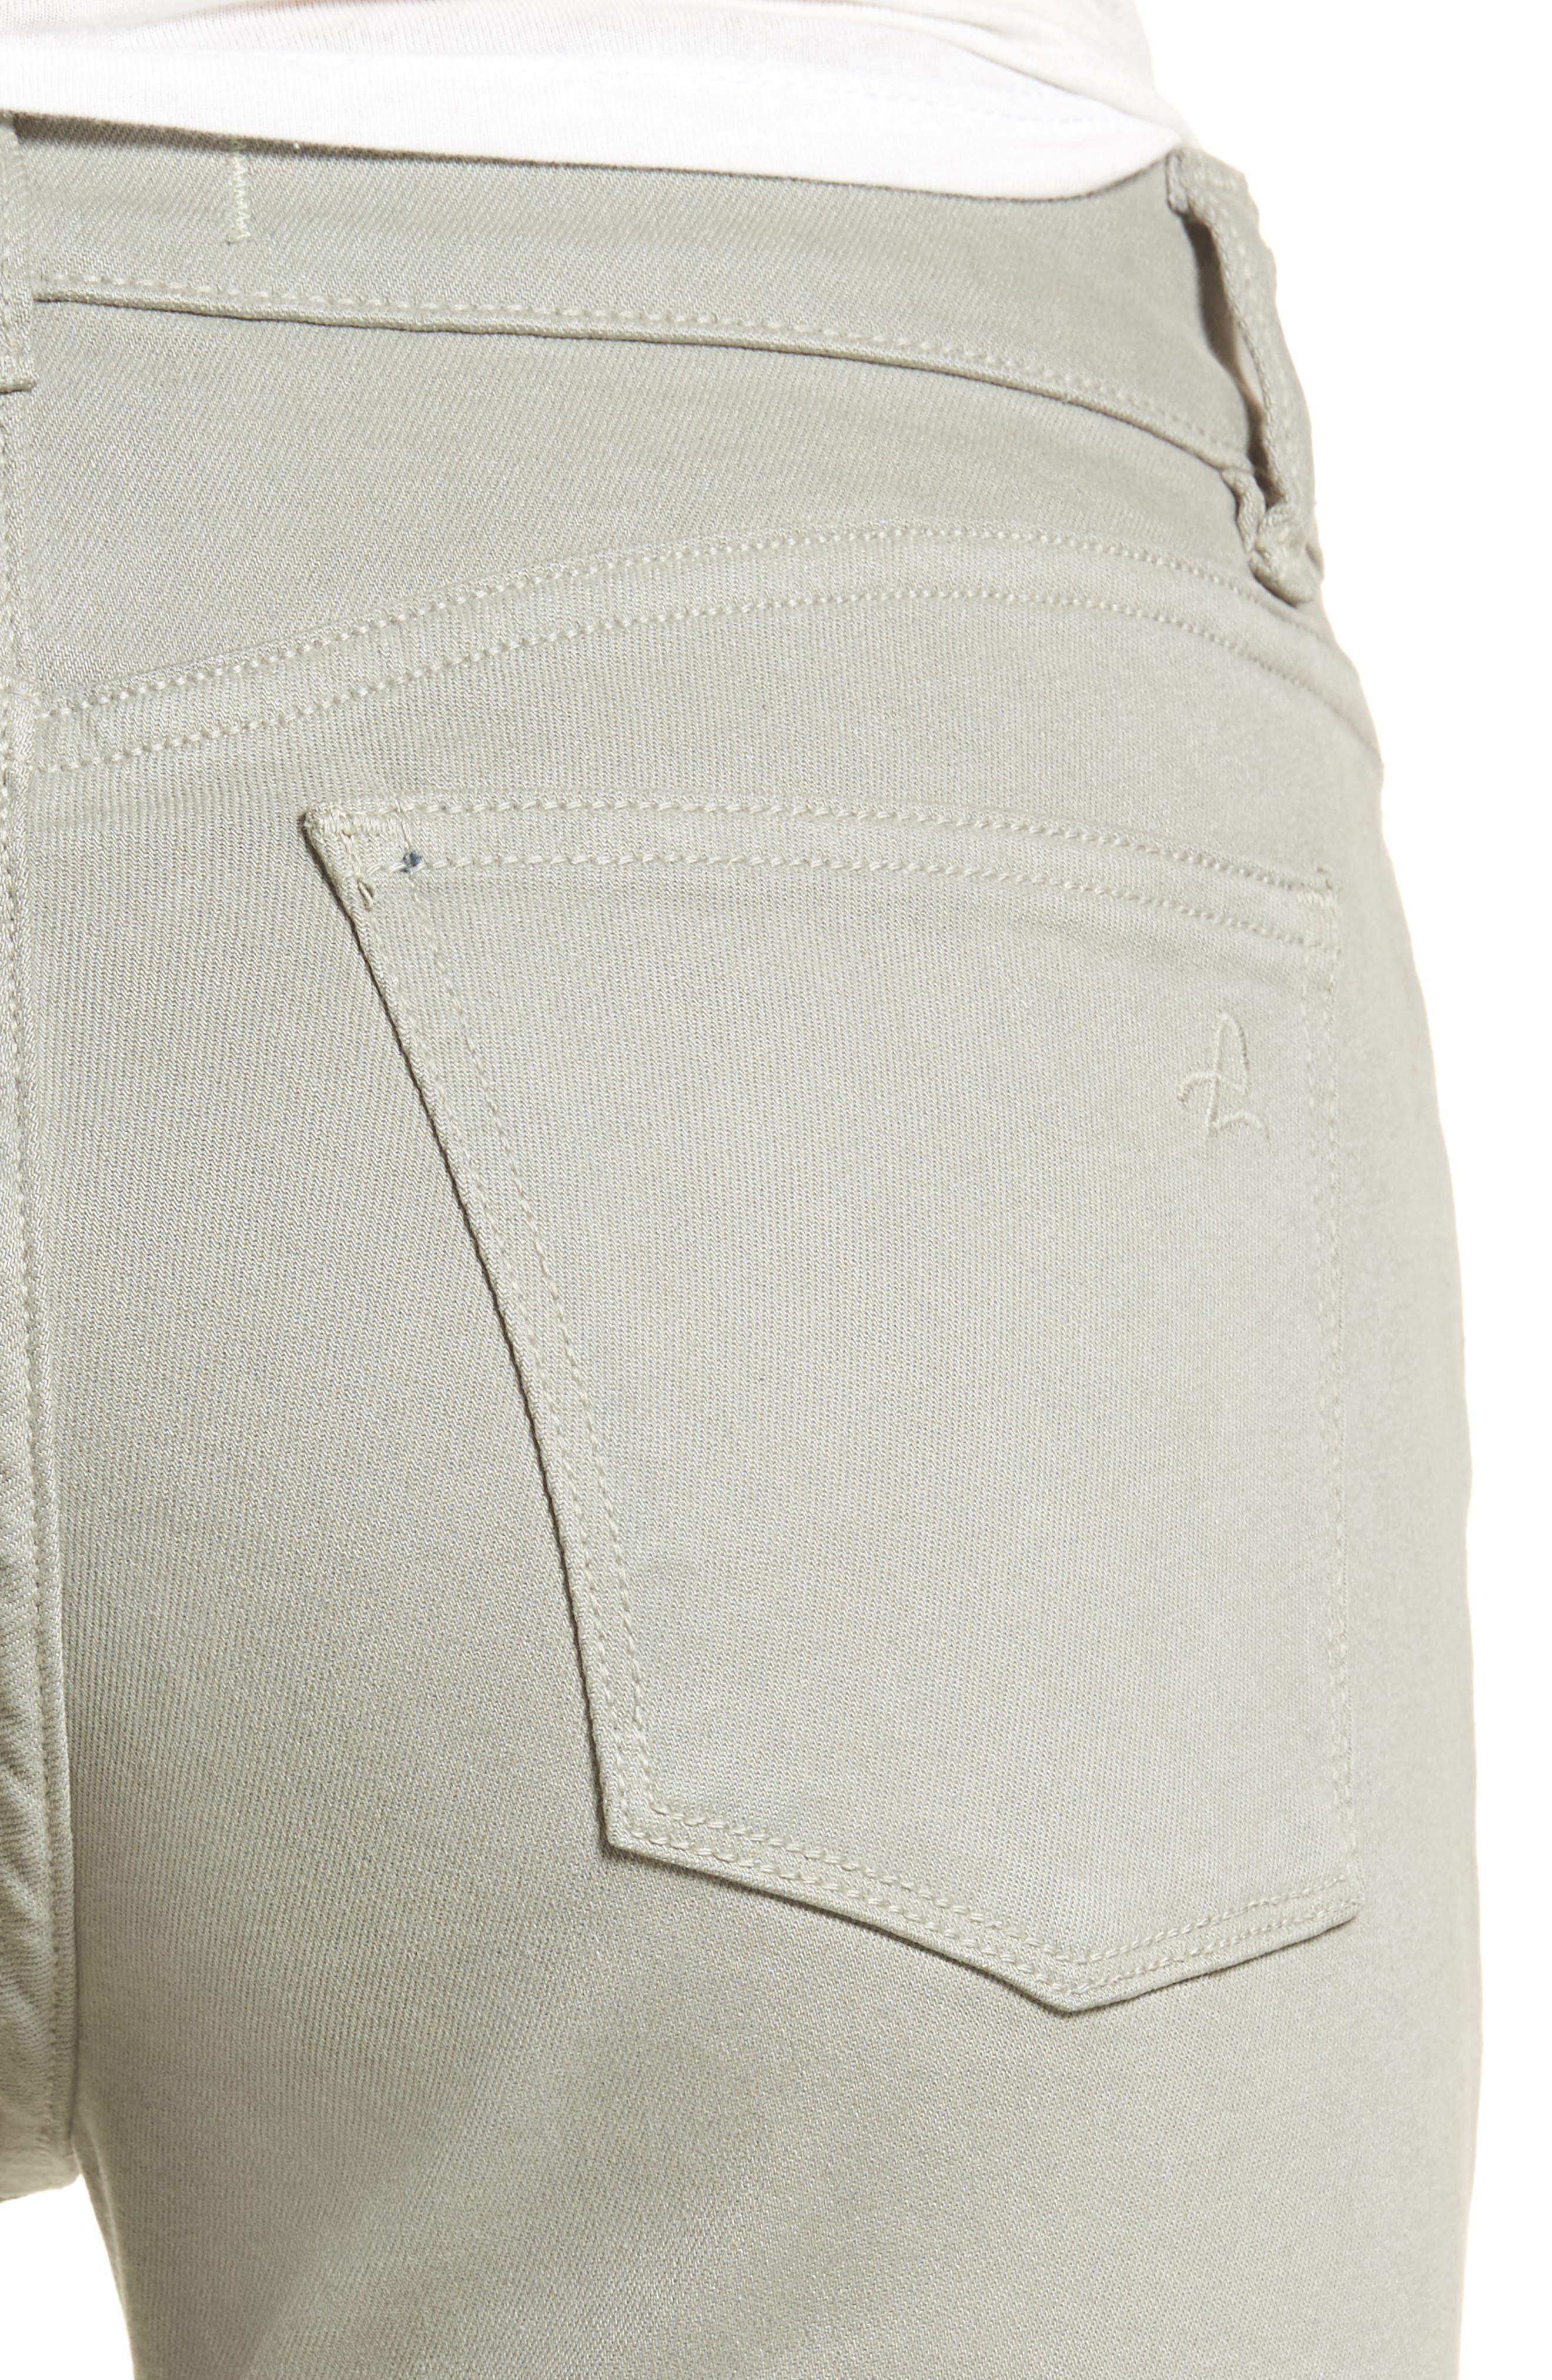 Florence Instasculpt Crop Skinny Jeans,                             Alternate thumbnail 4, color,                             Grove